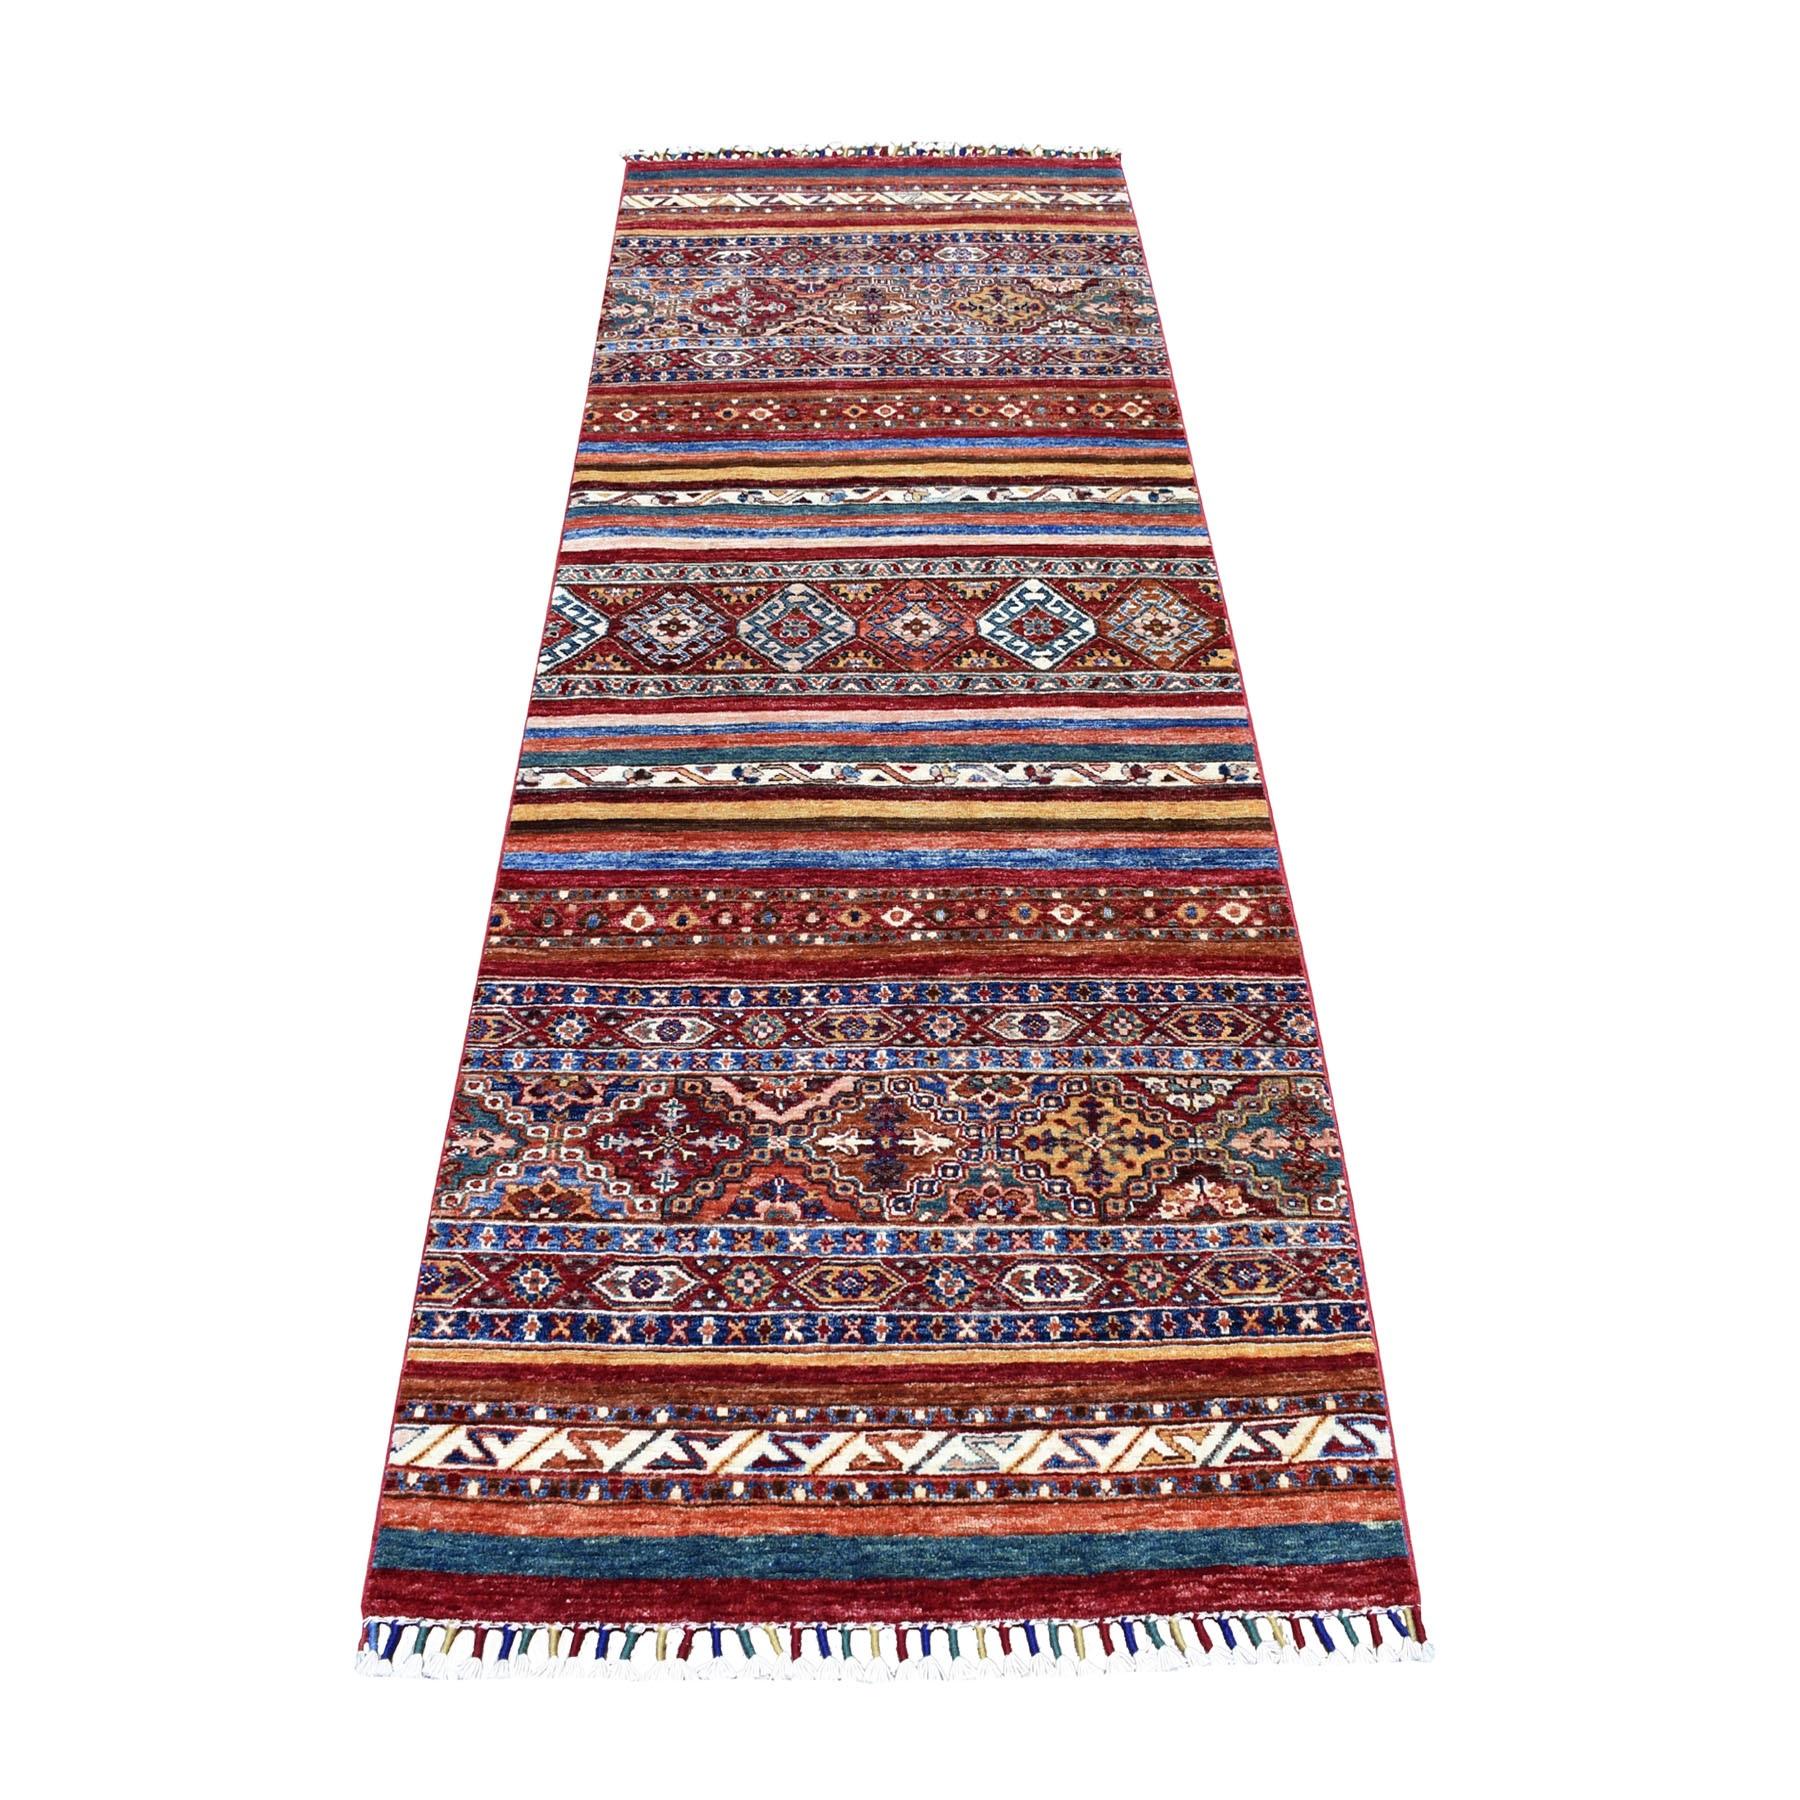 3'X8' Khorjin Design Runner Red Super Kazak Geometric Hand Knotted Pure Wool Oriental Rug moaeb8cc